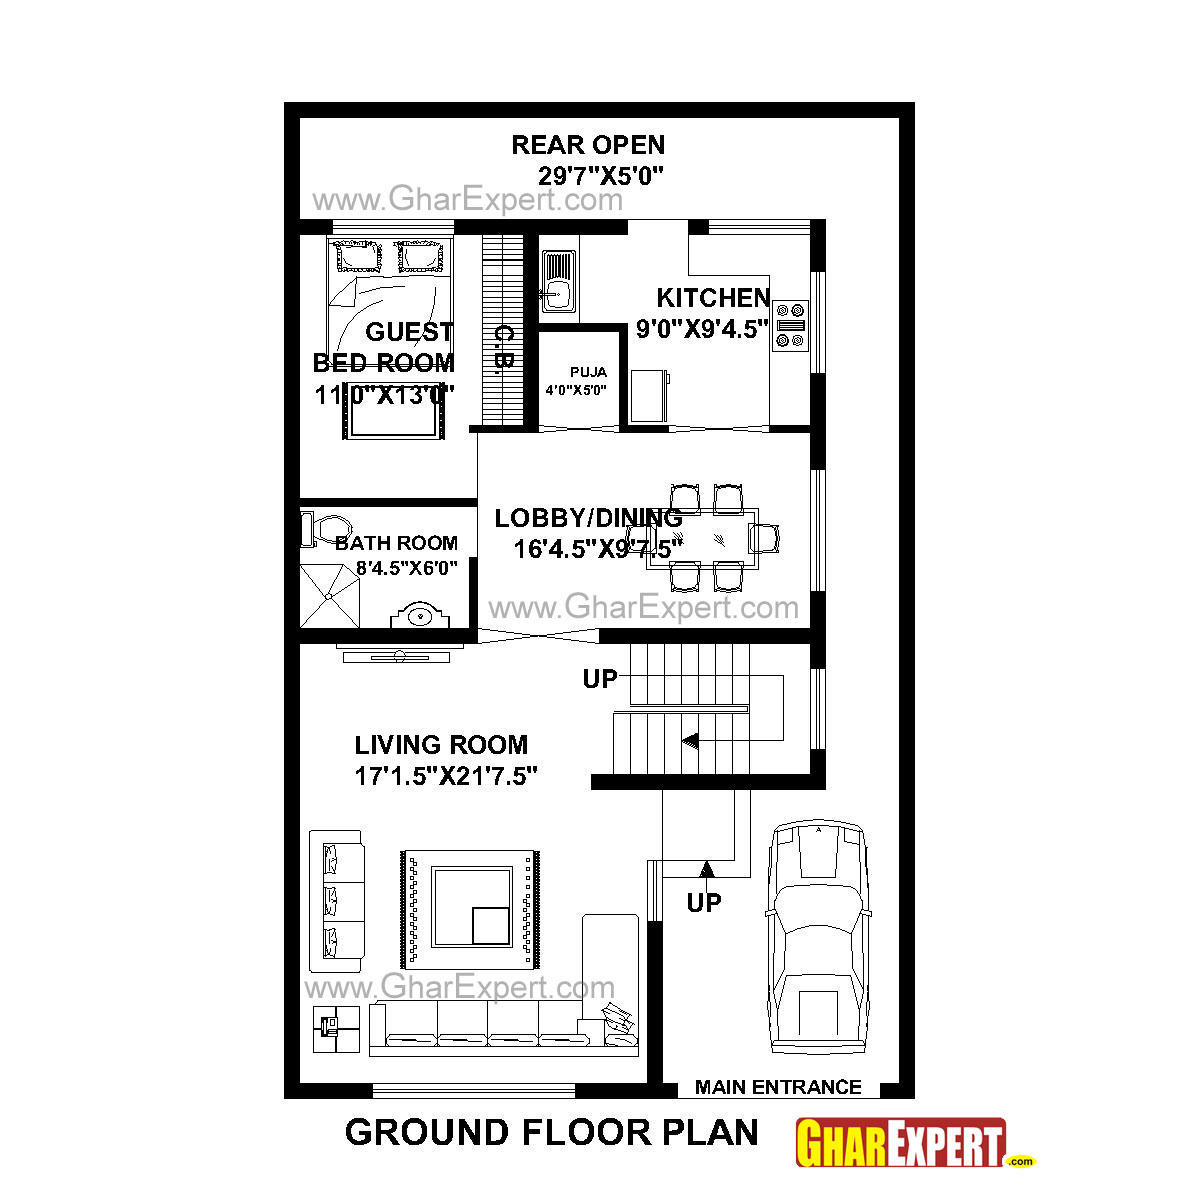 House Plan for 31 Feet by 49 Feet plot (Plot Size 169